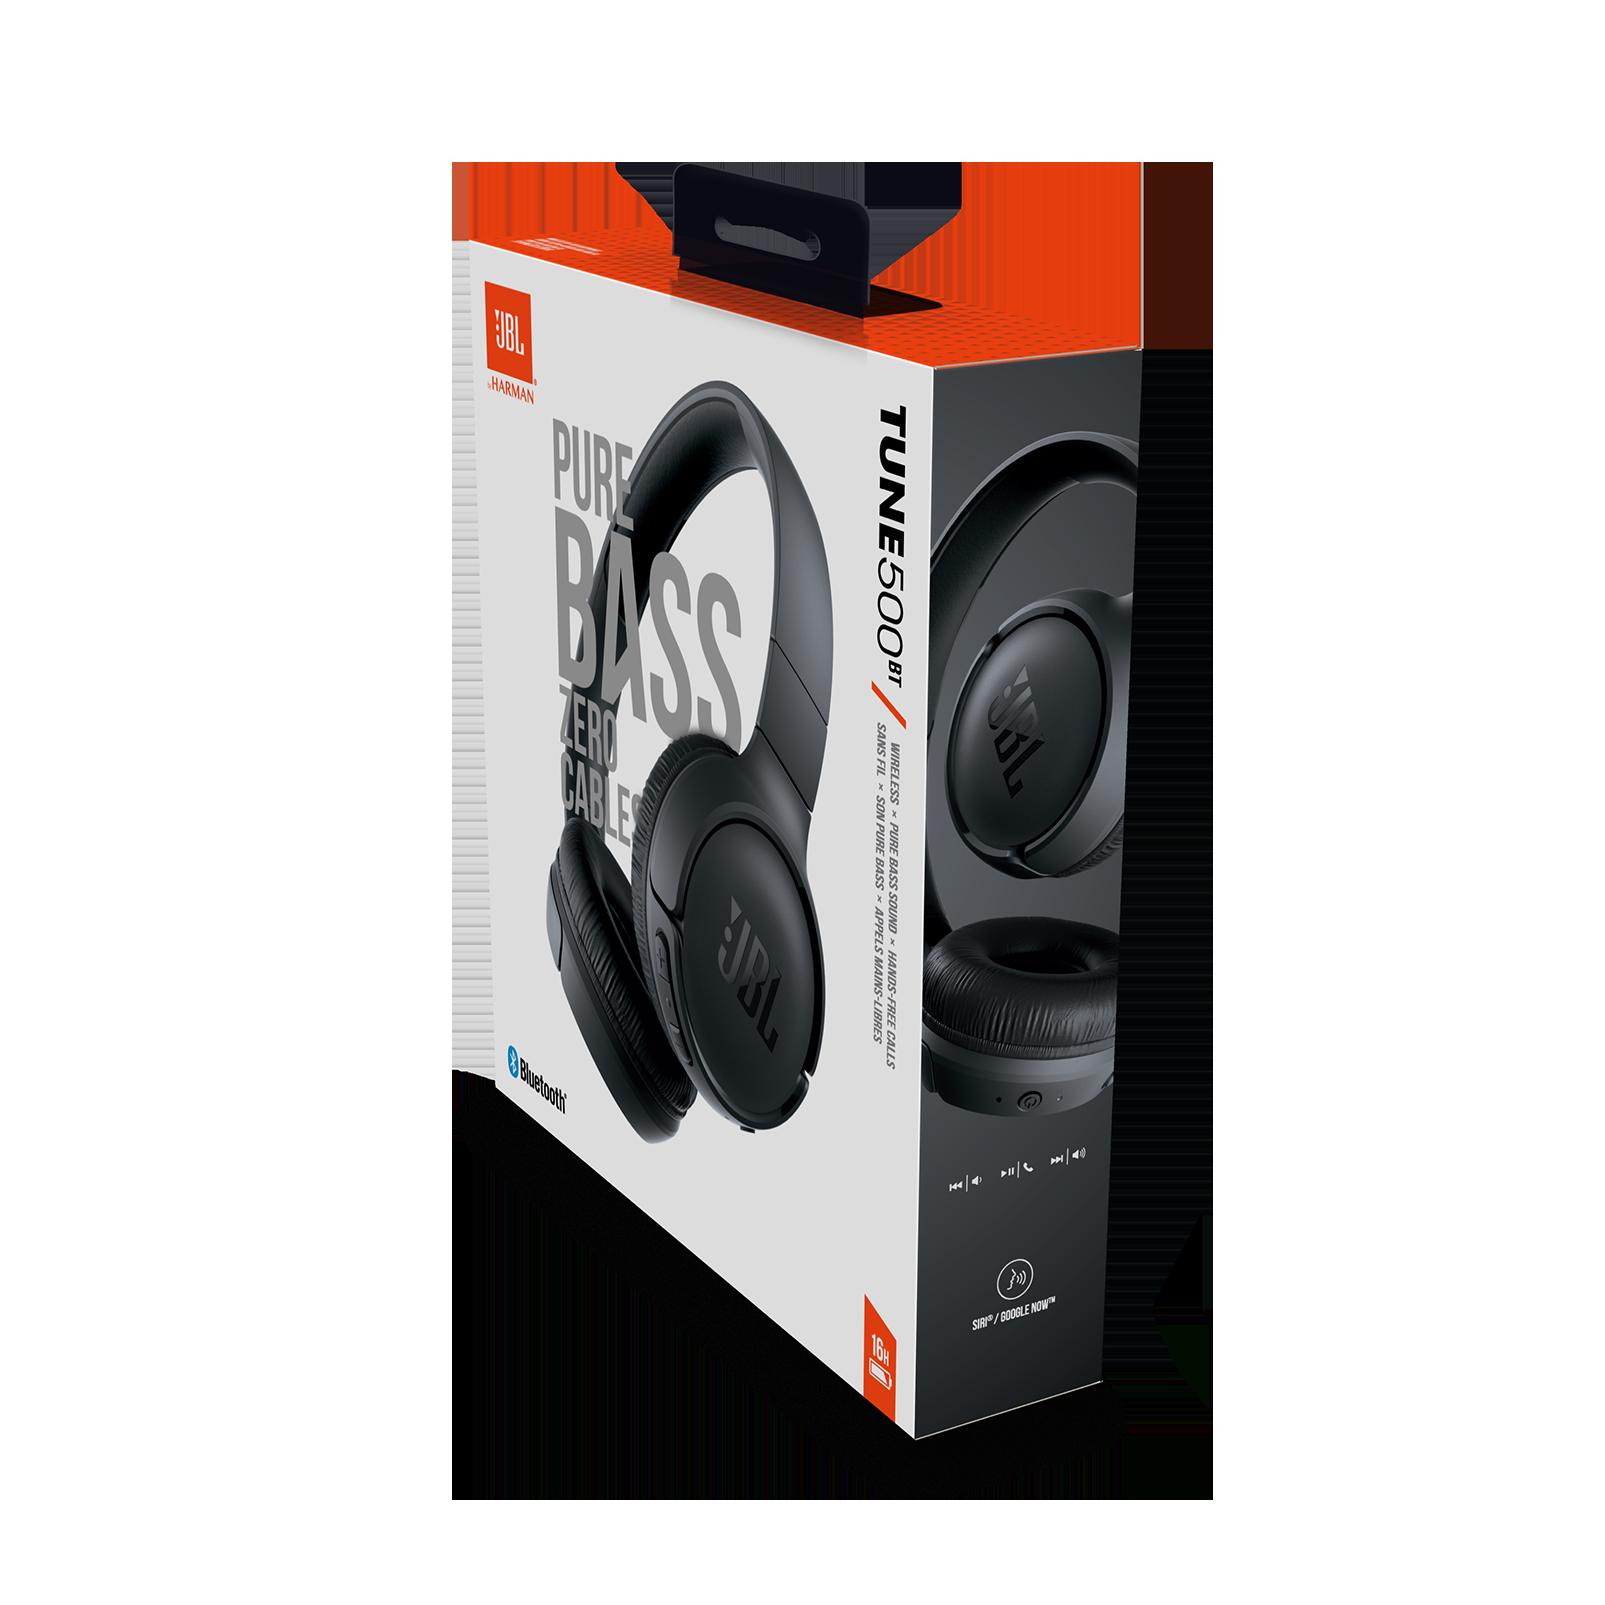 aaf237c38d0 JBL TUNE 500BT | Wireless on-ear headphones